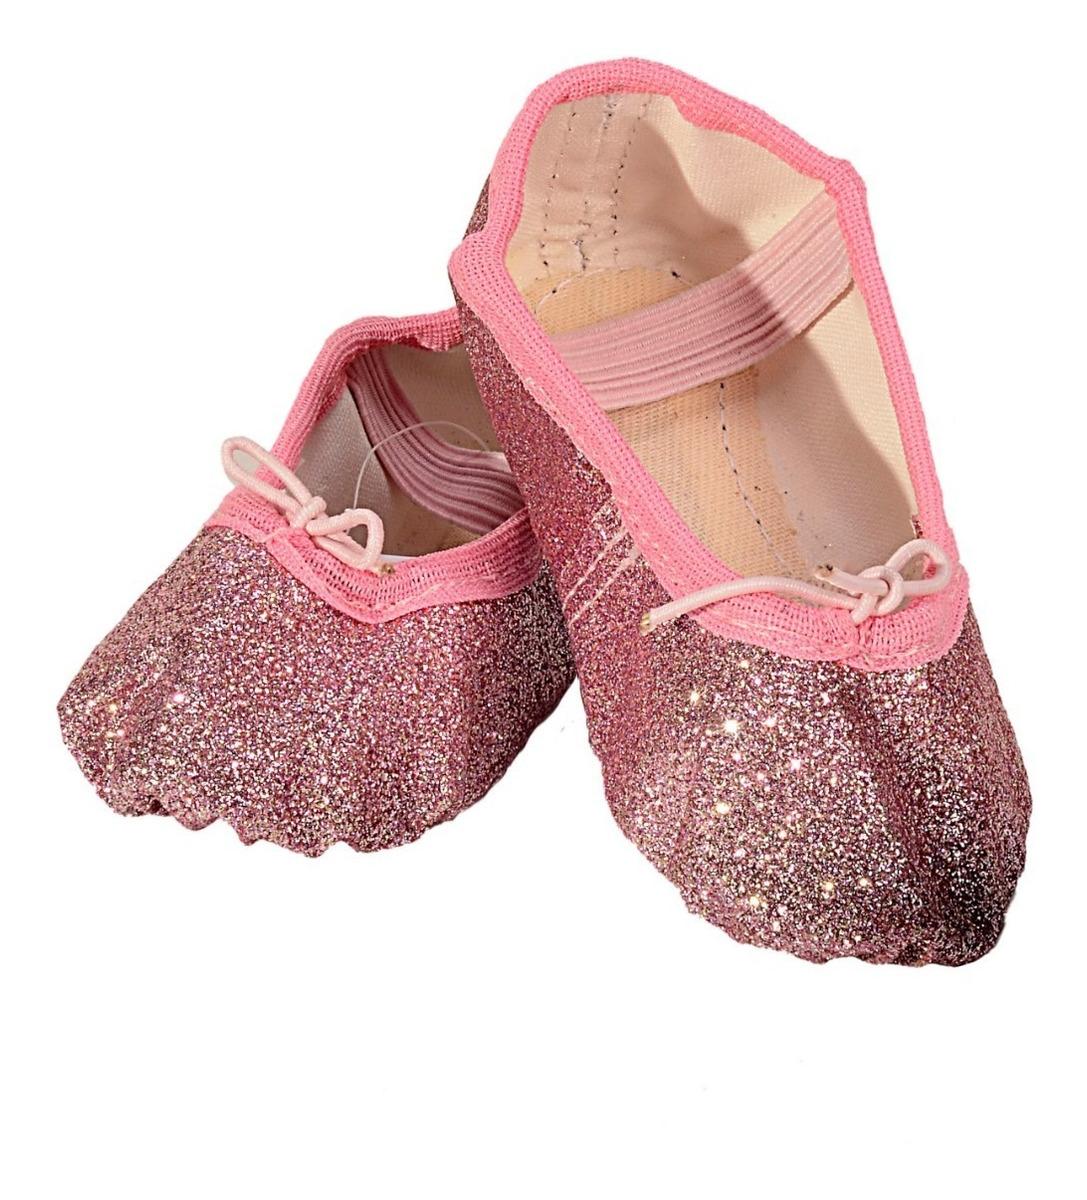 fb697725c34fe Sapatilha Glitter Ballet Infantil Cores - R$ 65,00 em Mercado Livre